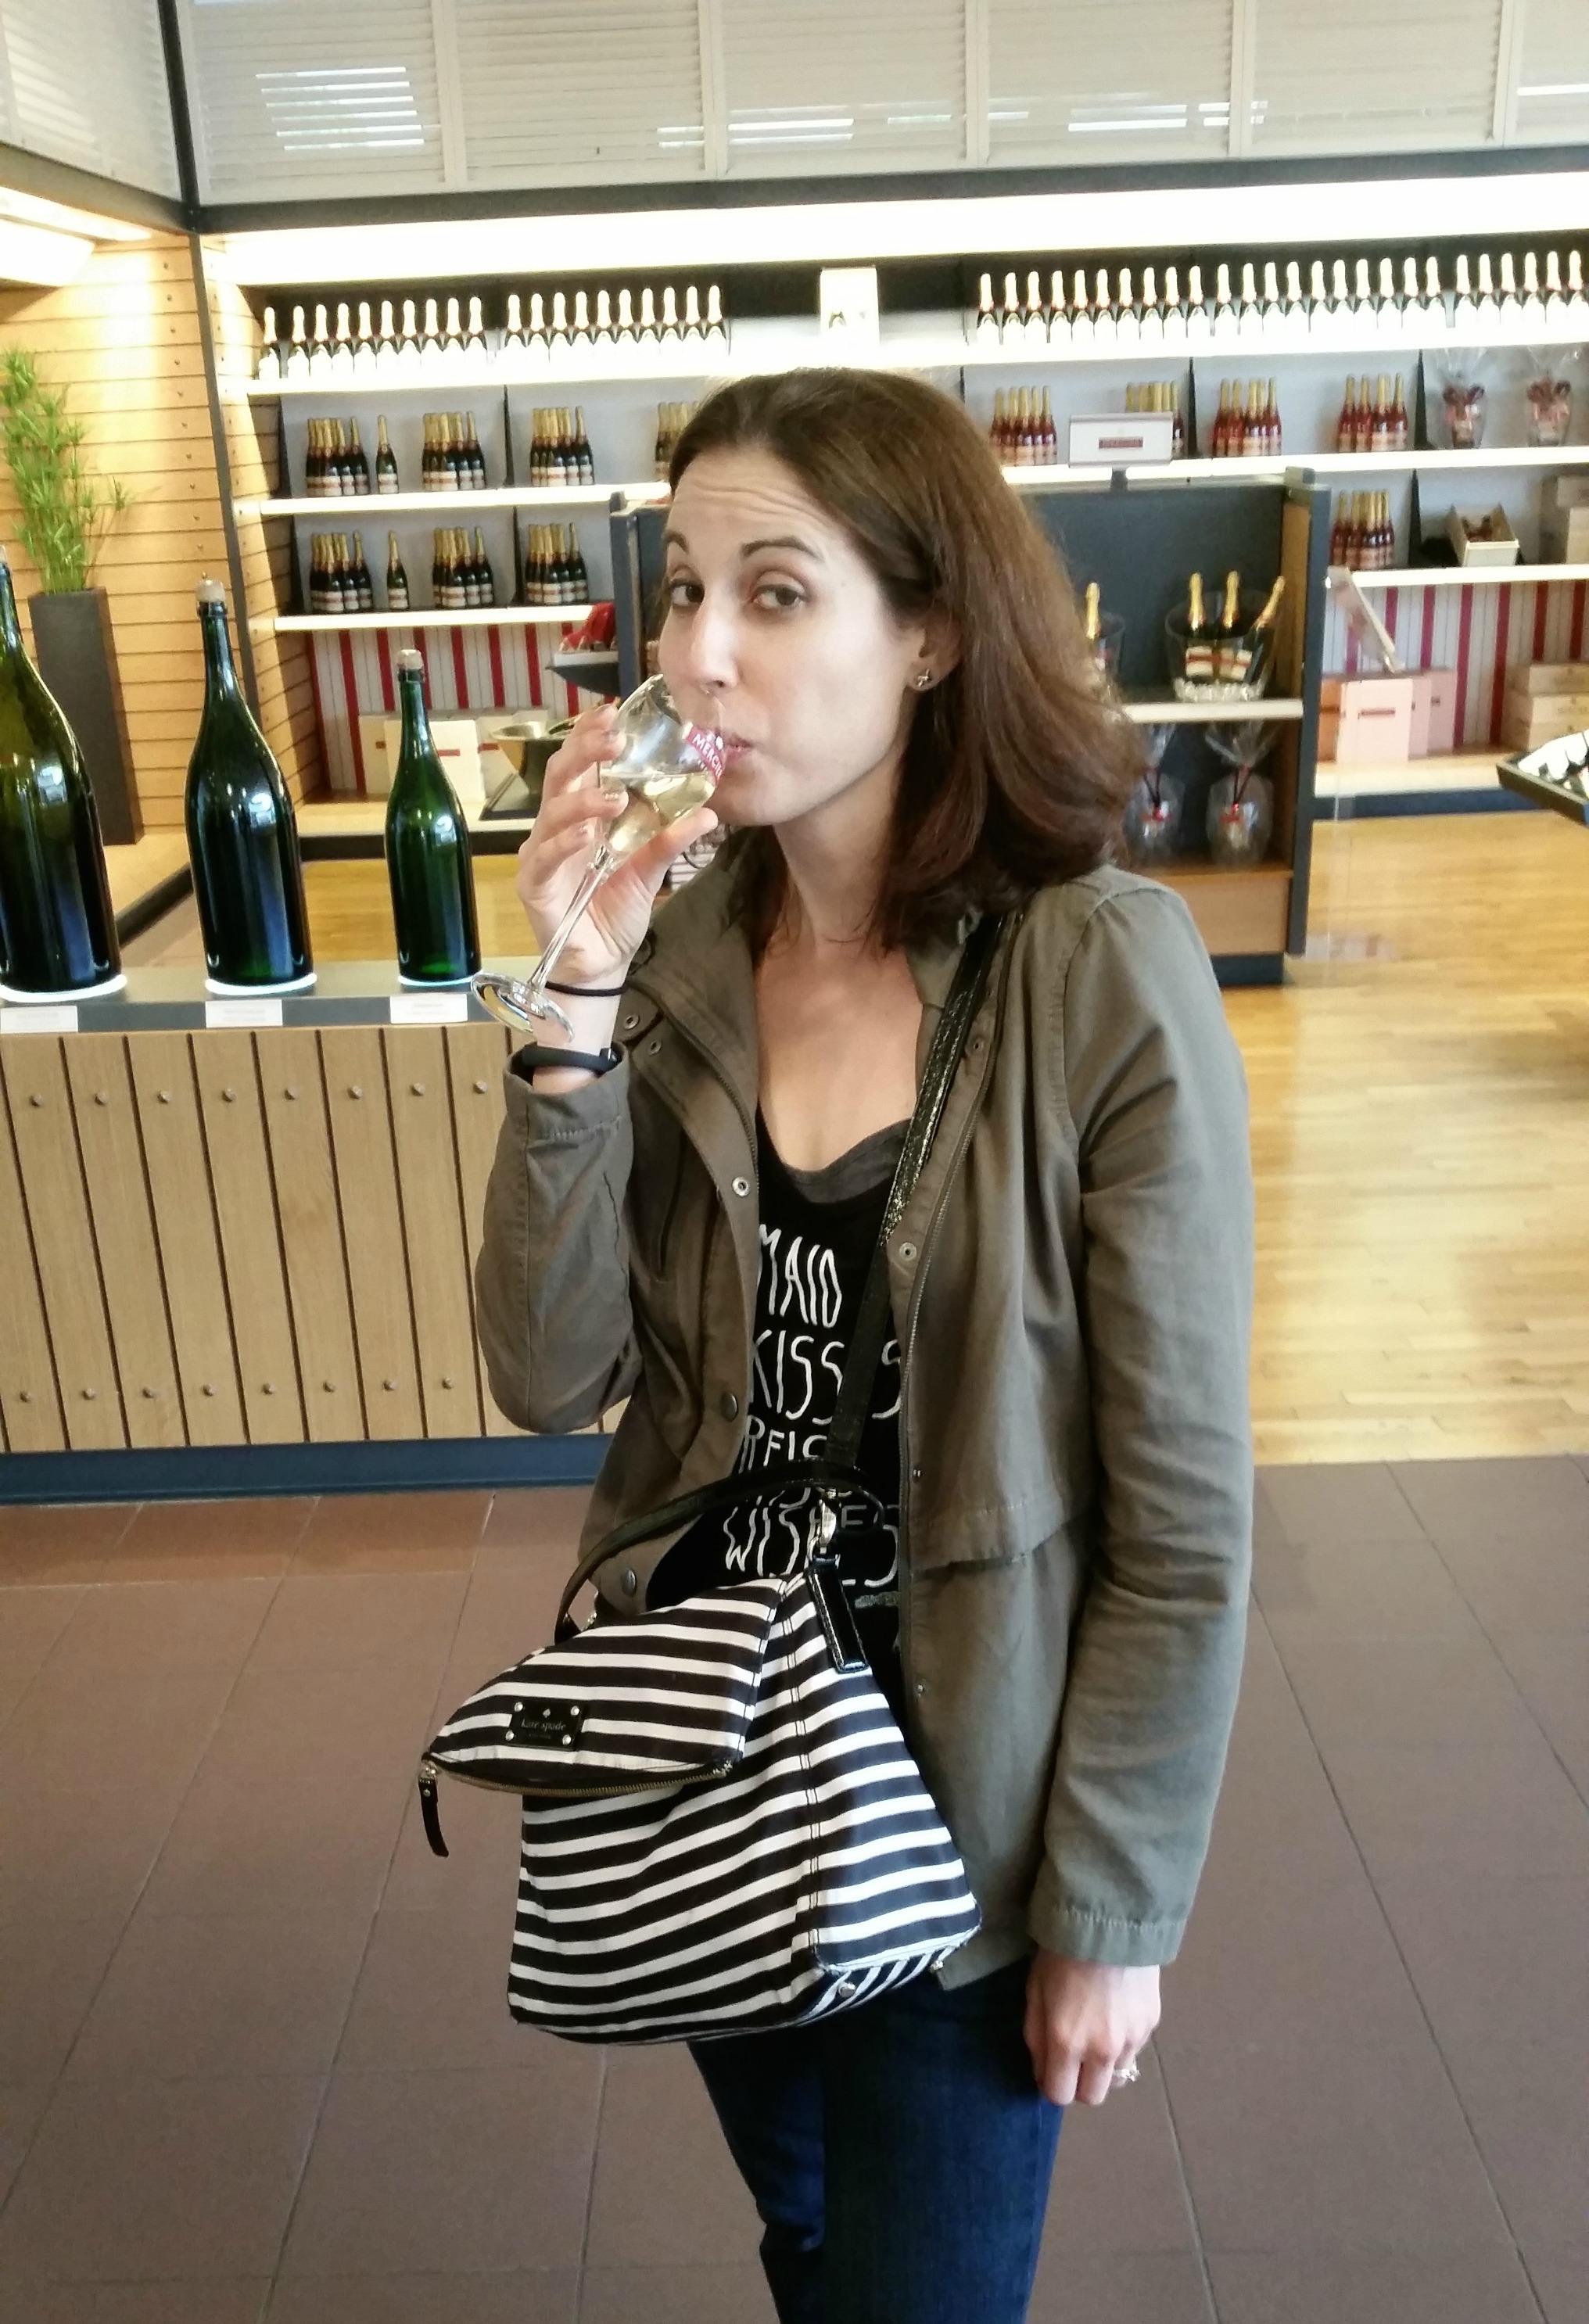 Champagne Tasting Epernay